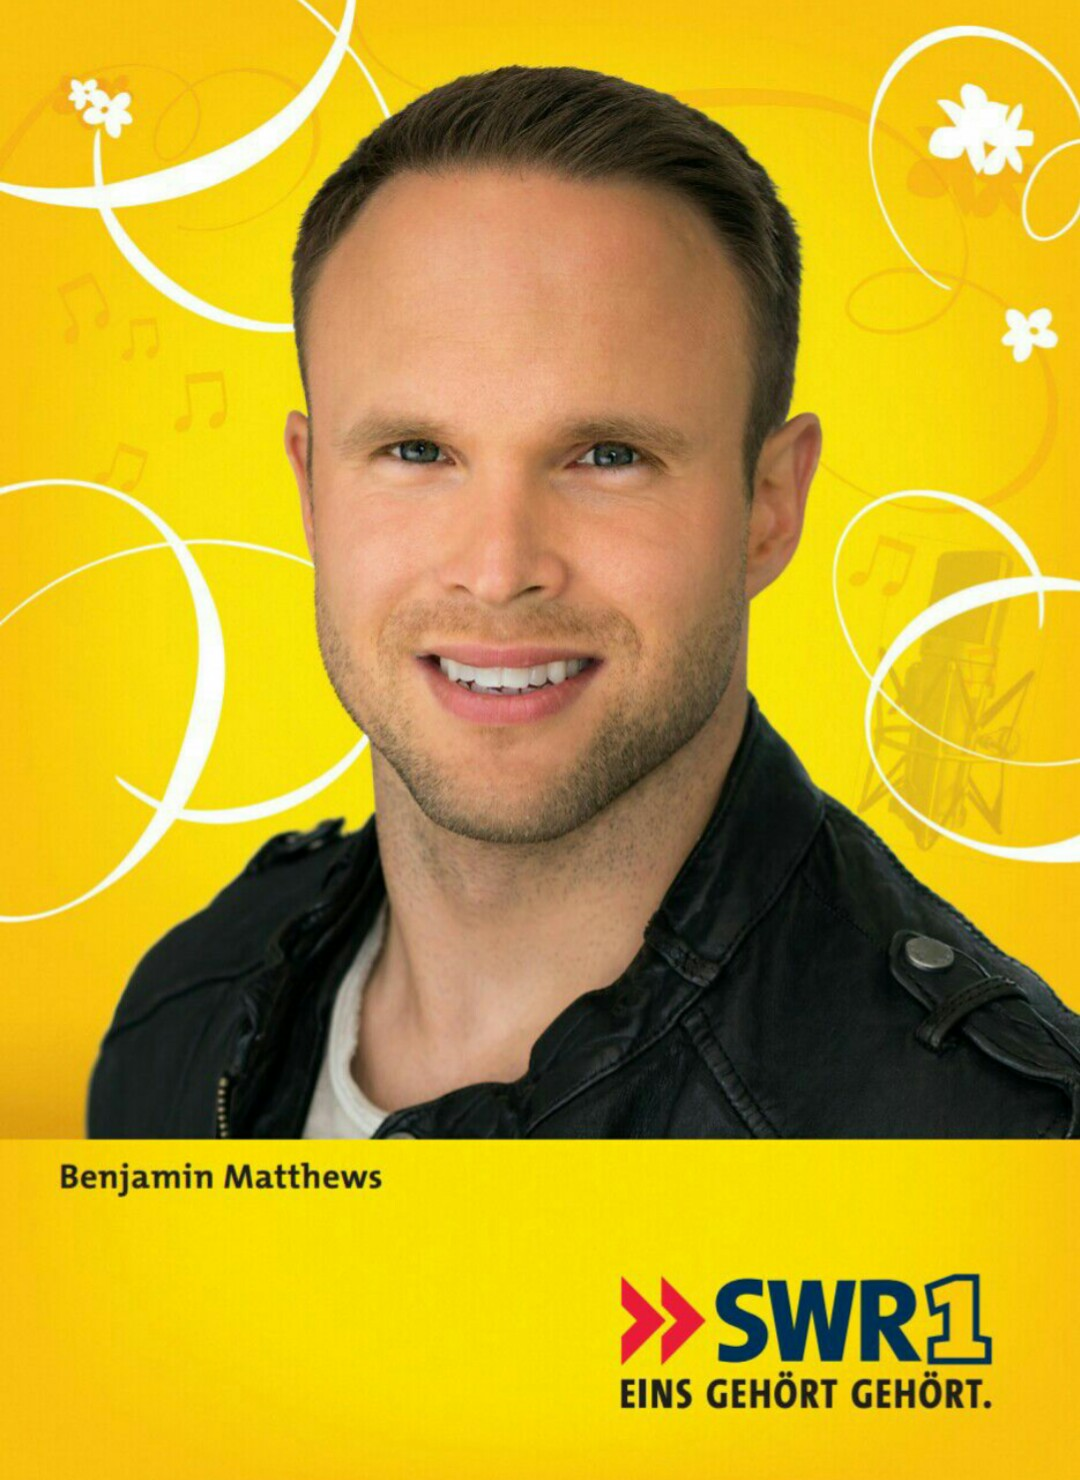 Benjamin Matthews auf Autogrammkarte